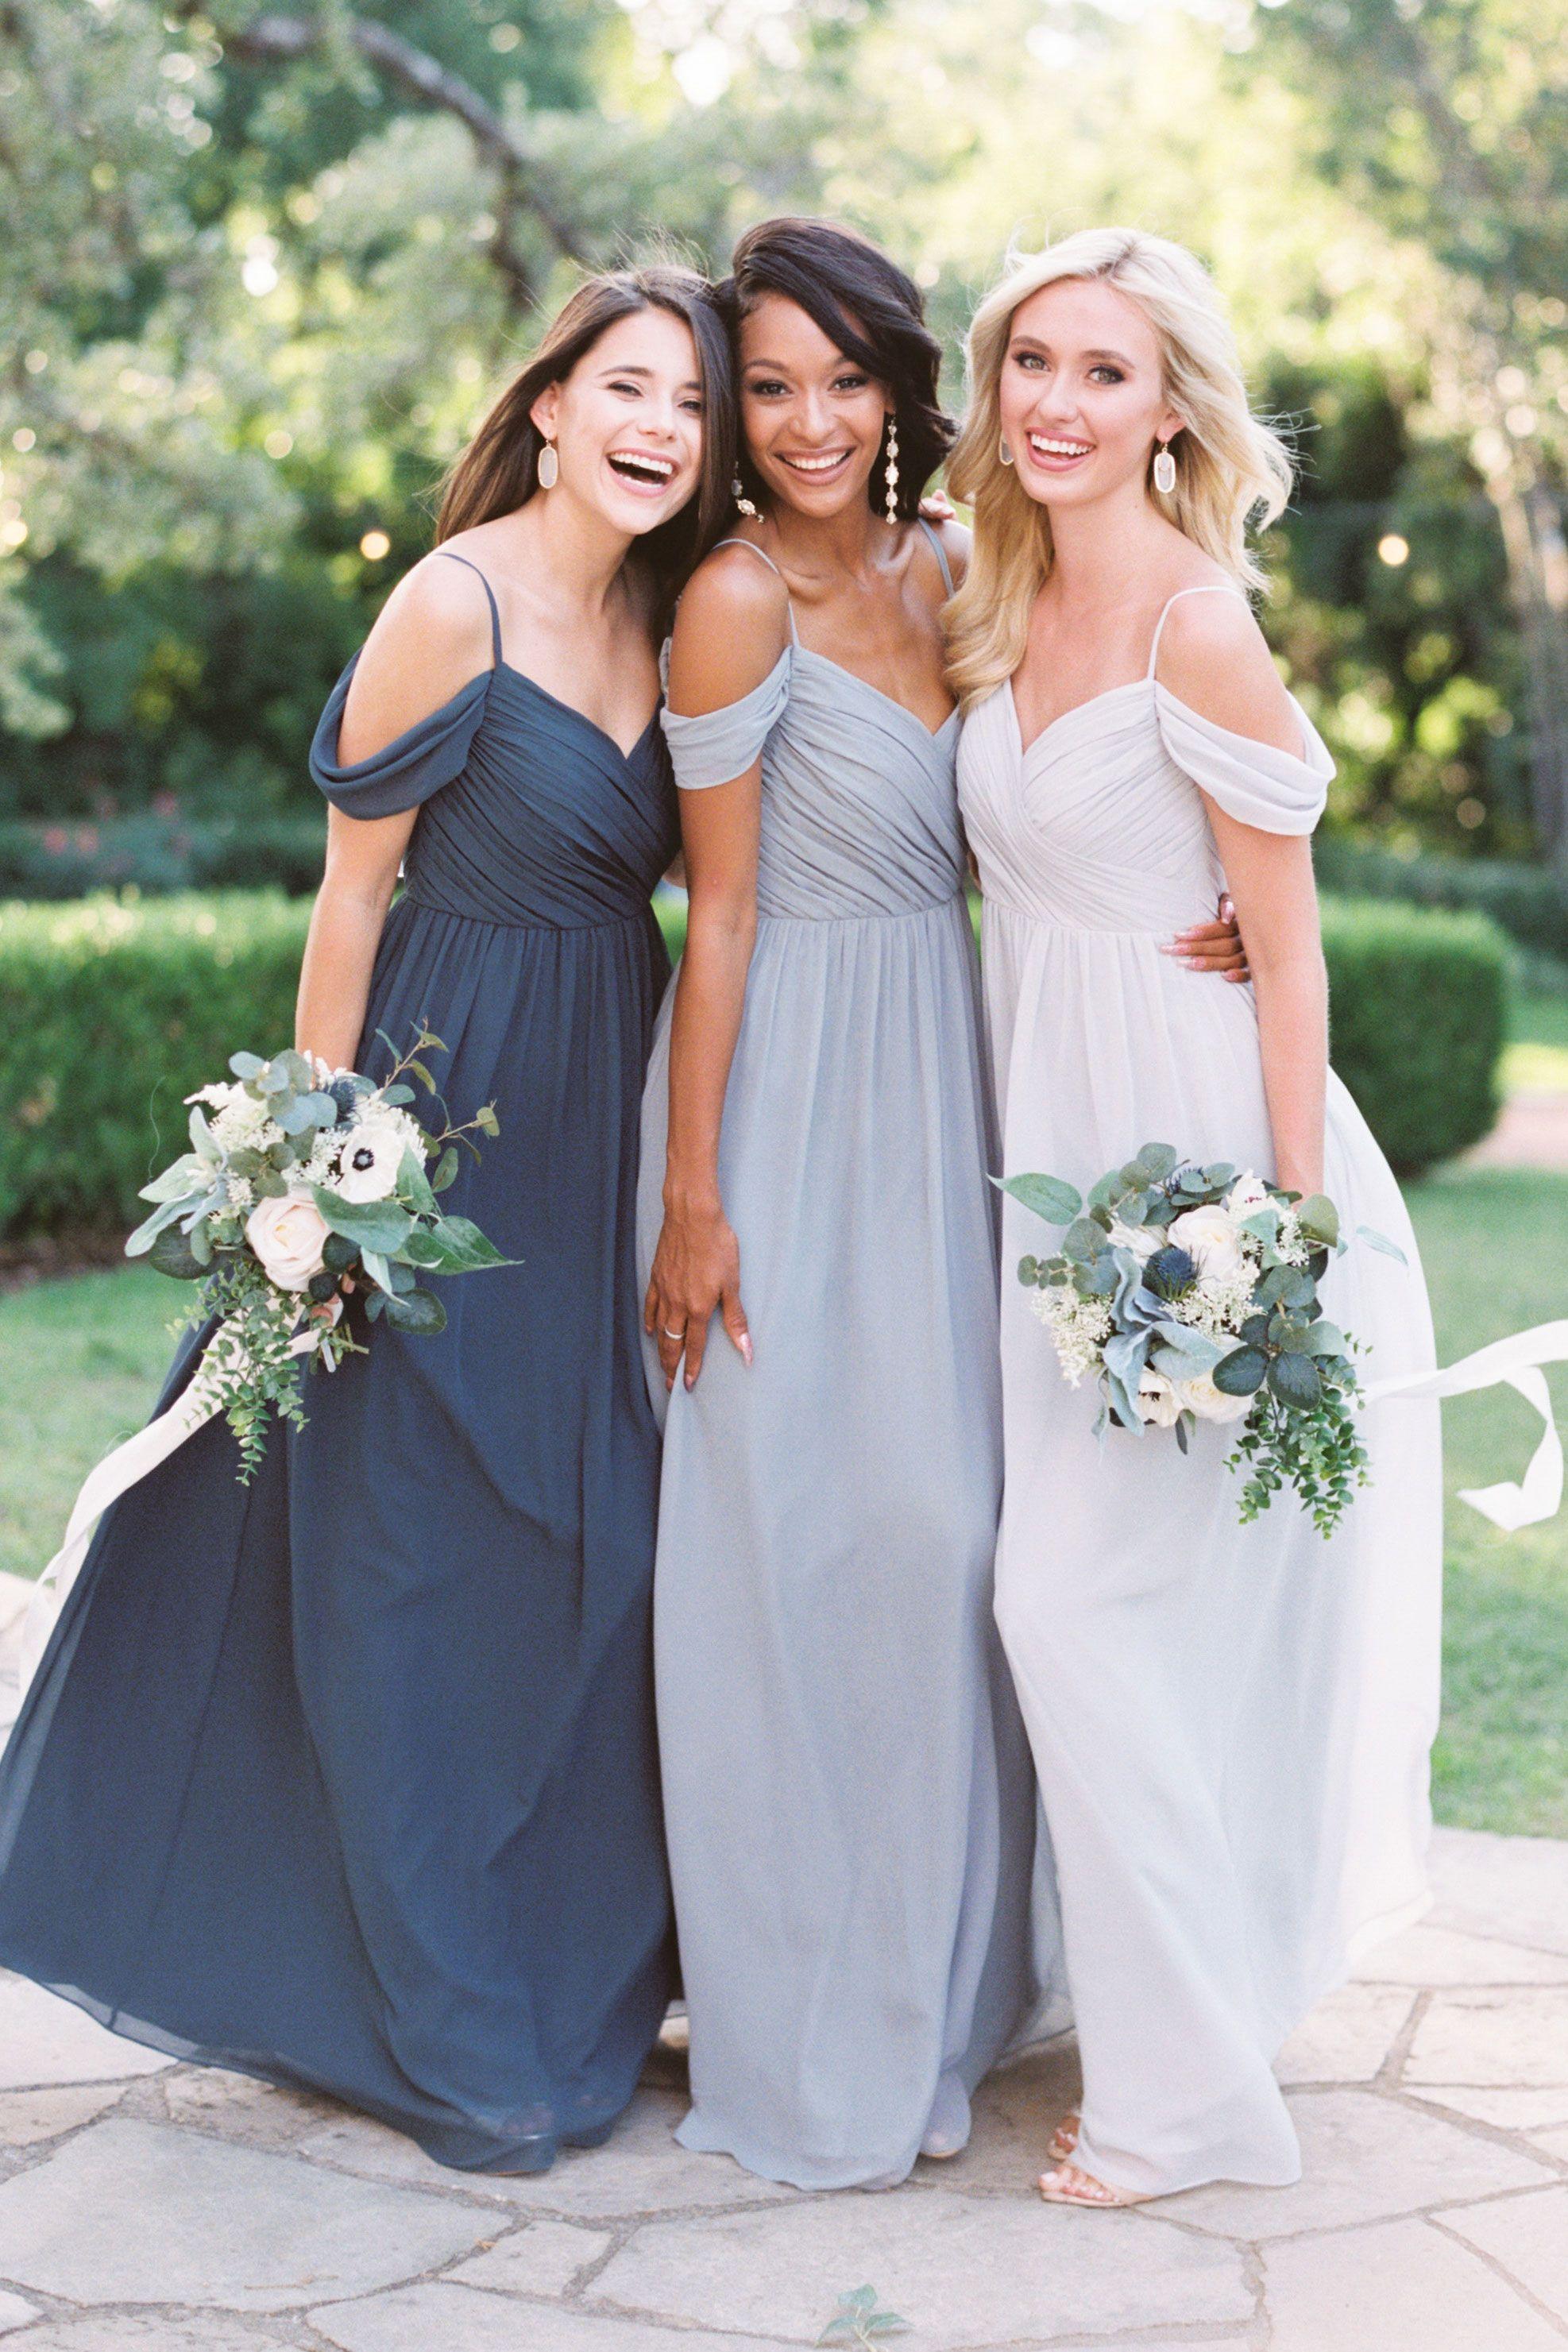 Lily Chiffon Dress Wedding Bridesmaid Dresses Bridesmaid